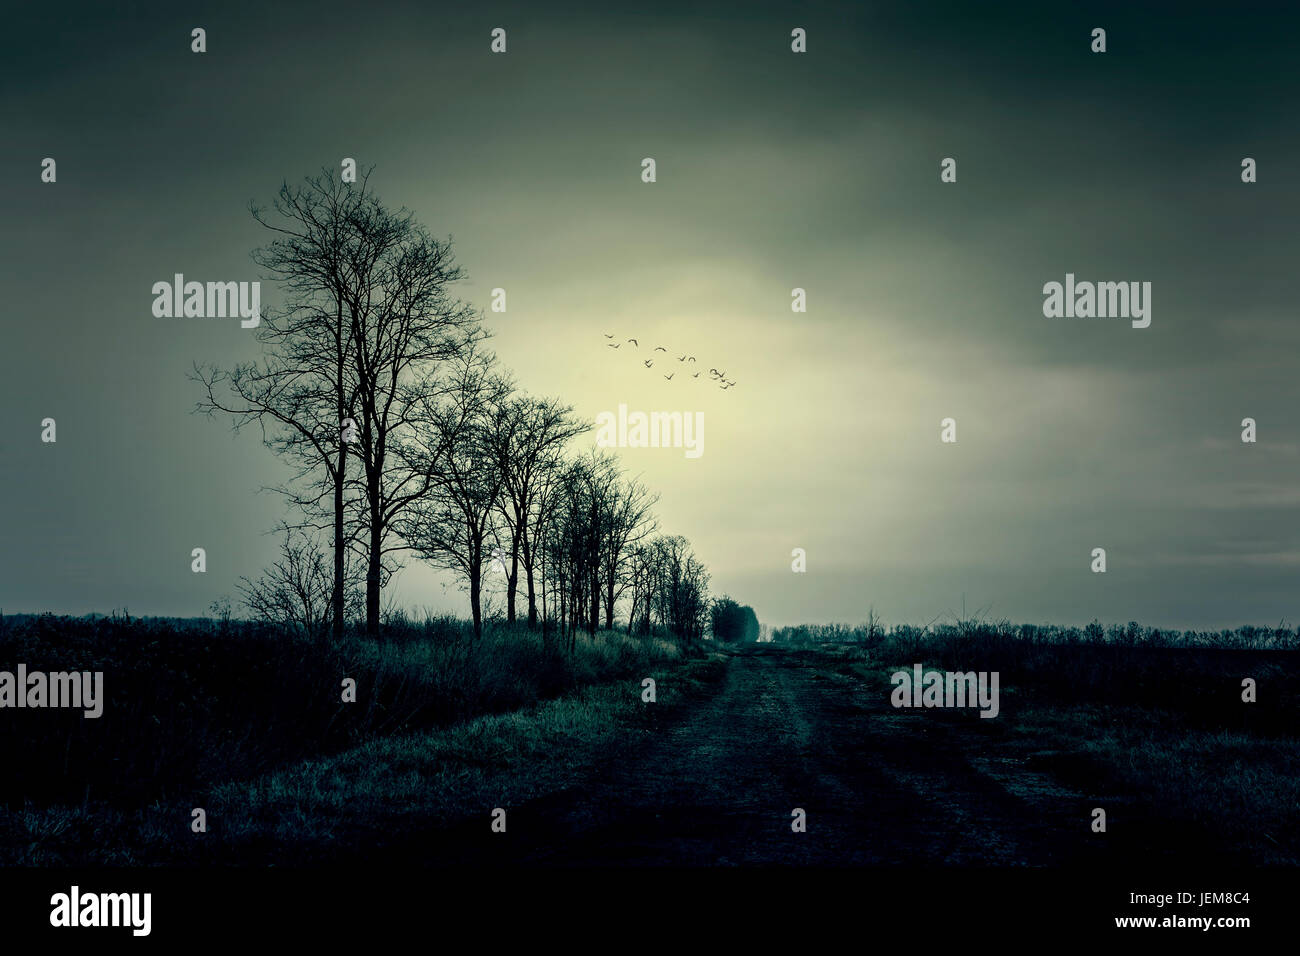 Stimmungsvolle Foto trockene Bäume Stockbild